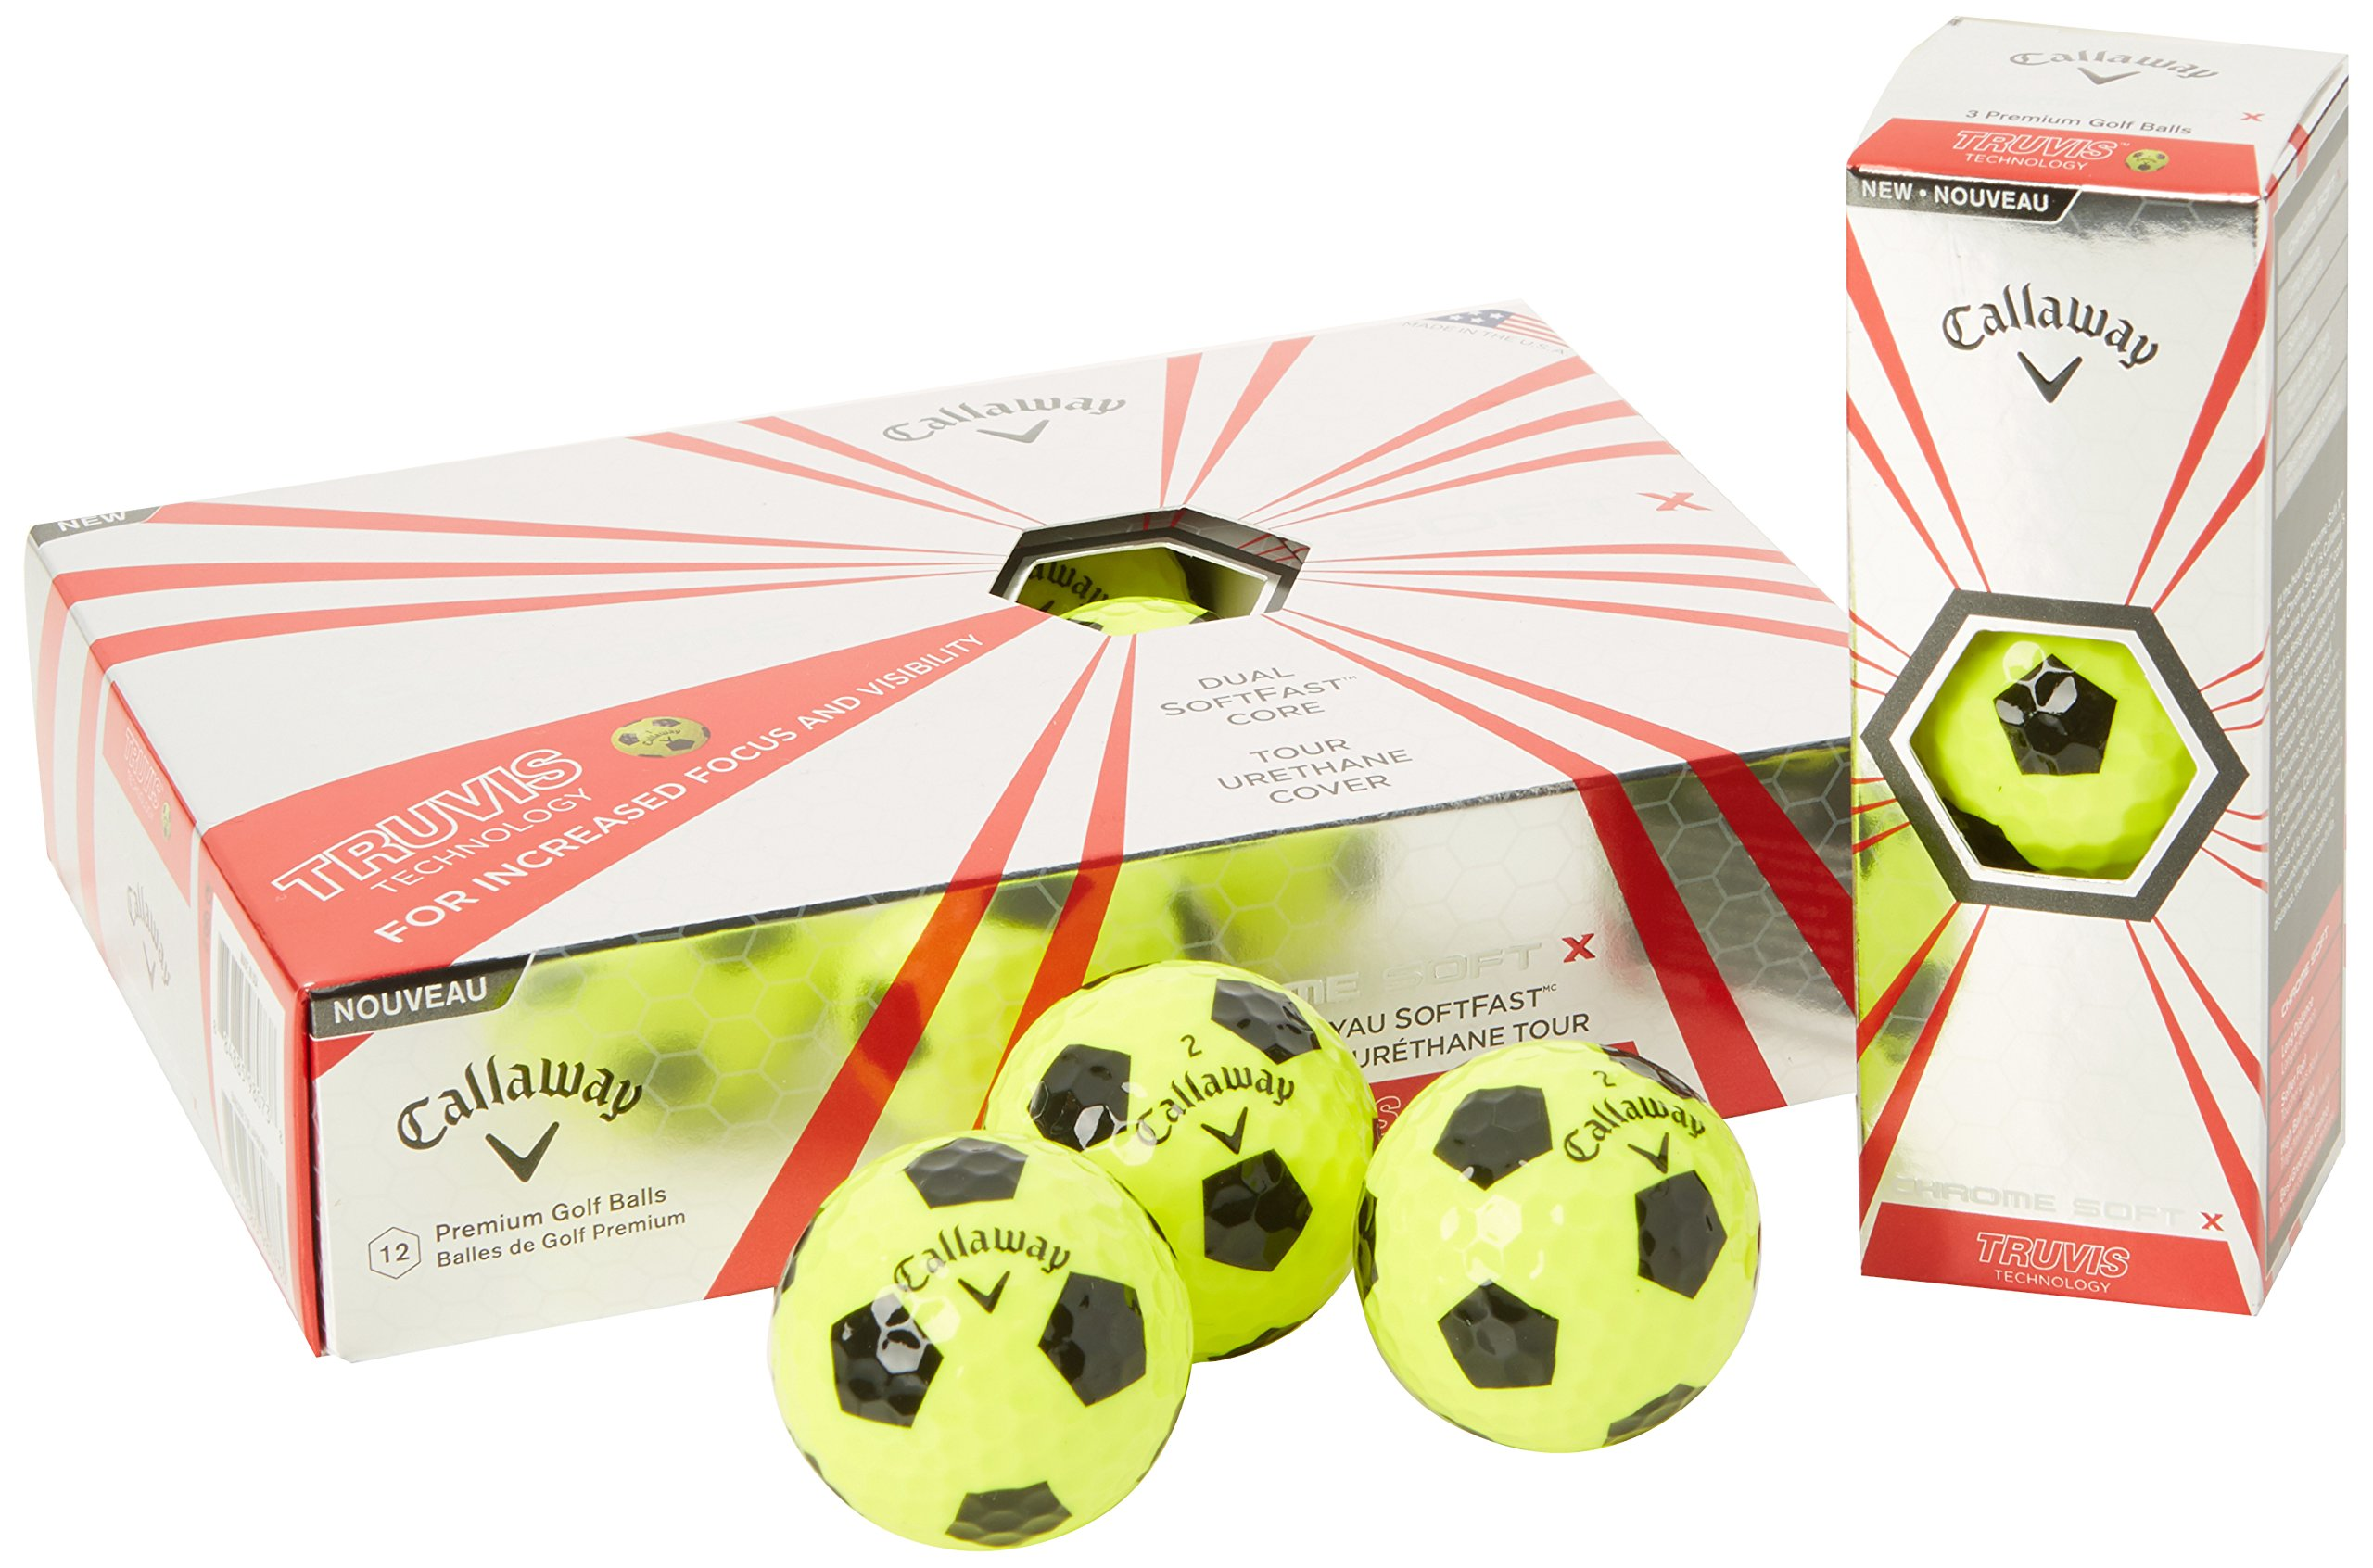 Callaway Chrome Soft X Golf Balls, Prior Generation, (One Dozen), Yellow/Black Truvis Pattern by Callaway